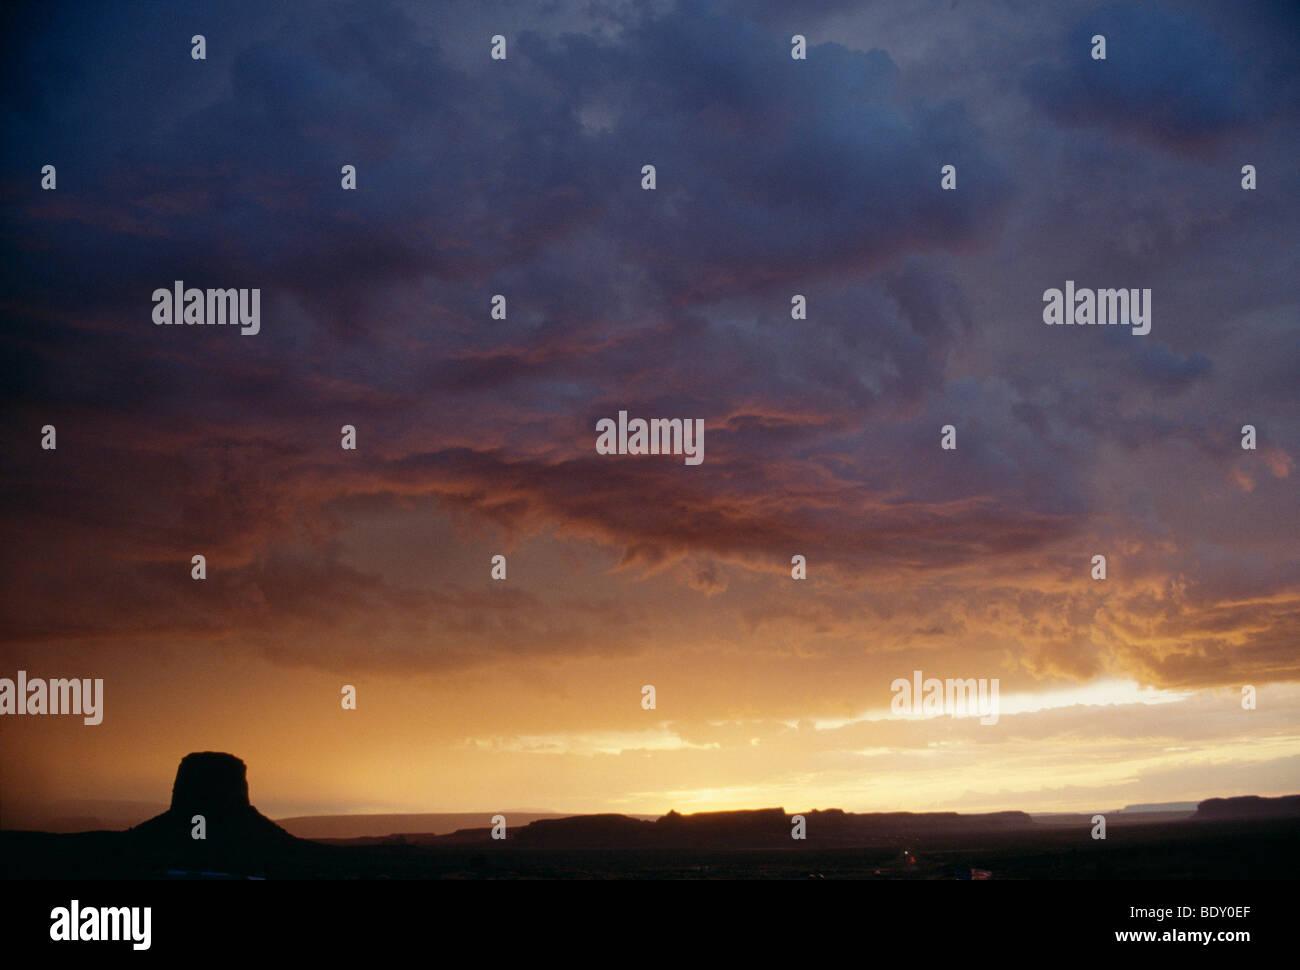 Sunset with menacing storm clouds over Monument Valley, Kayenta, Arizona, USA - Stock Image